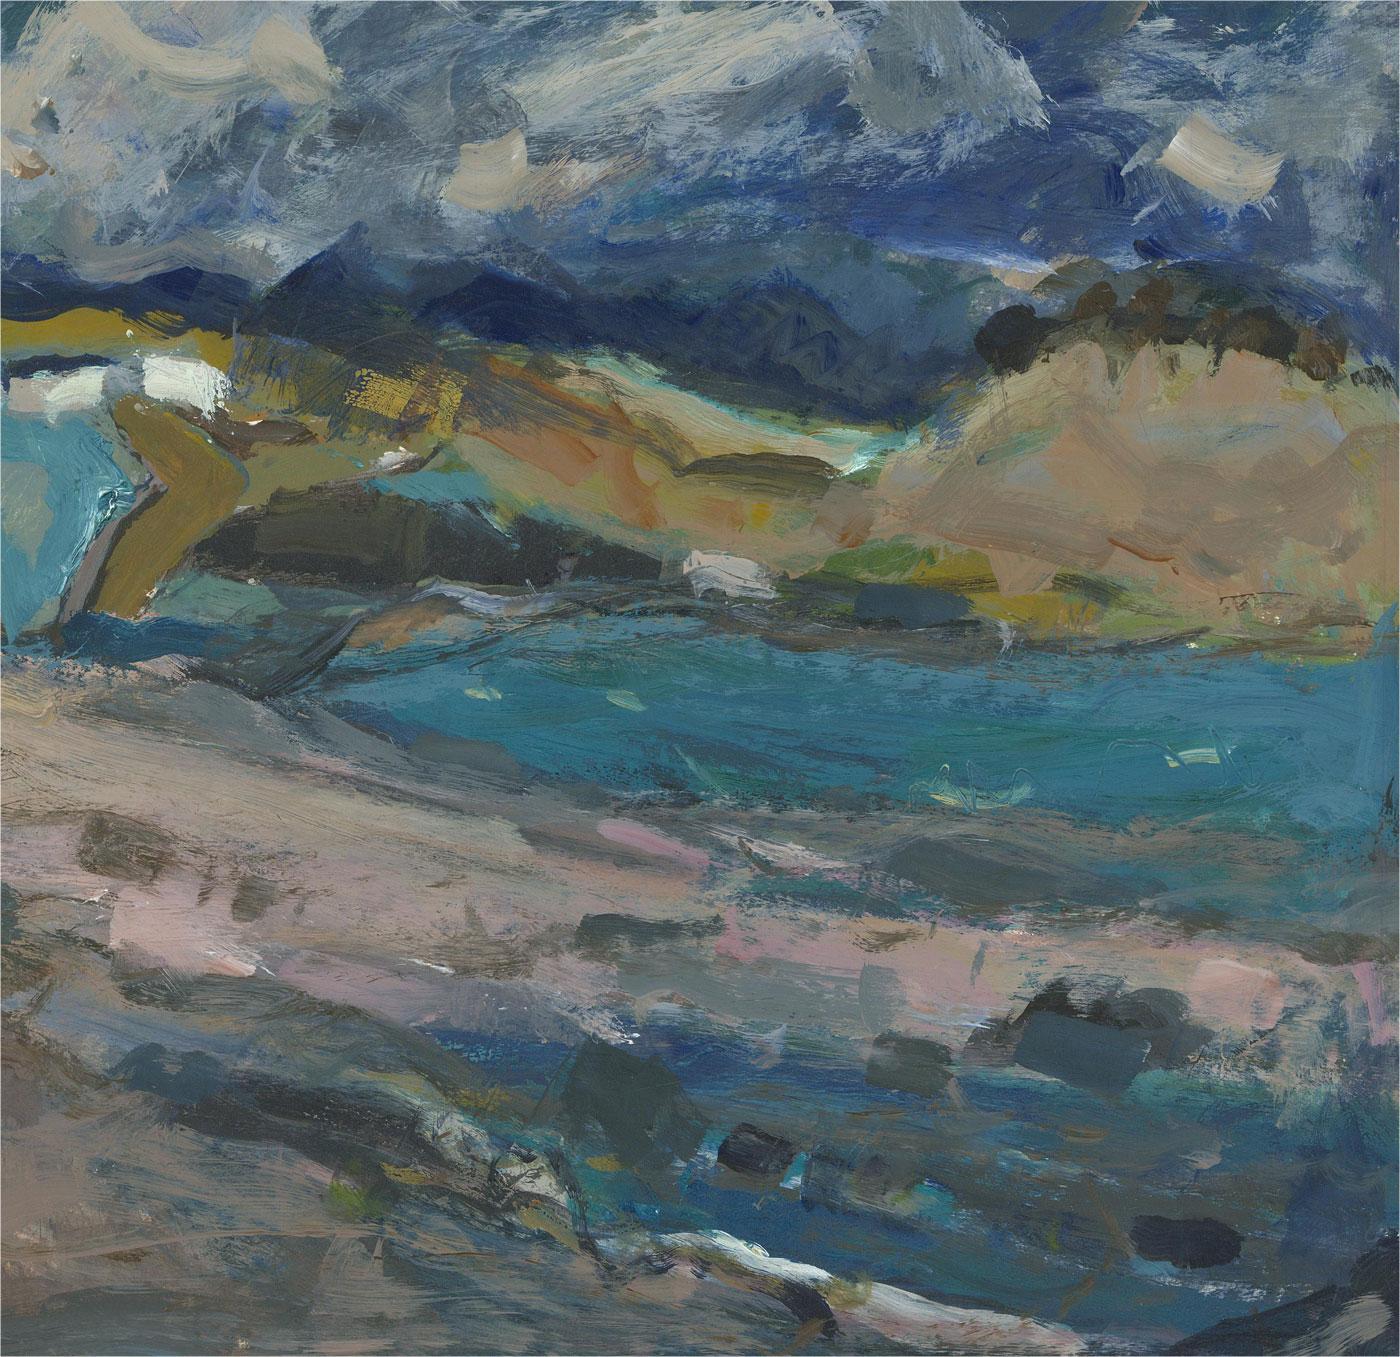 Sheila Macnab Macmillan (1928-2018) - 2018 Acrylic, Ettrick Bay, Scotland